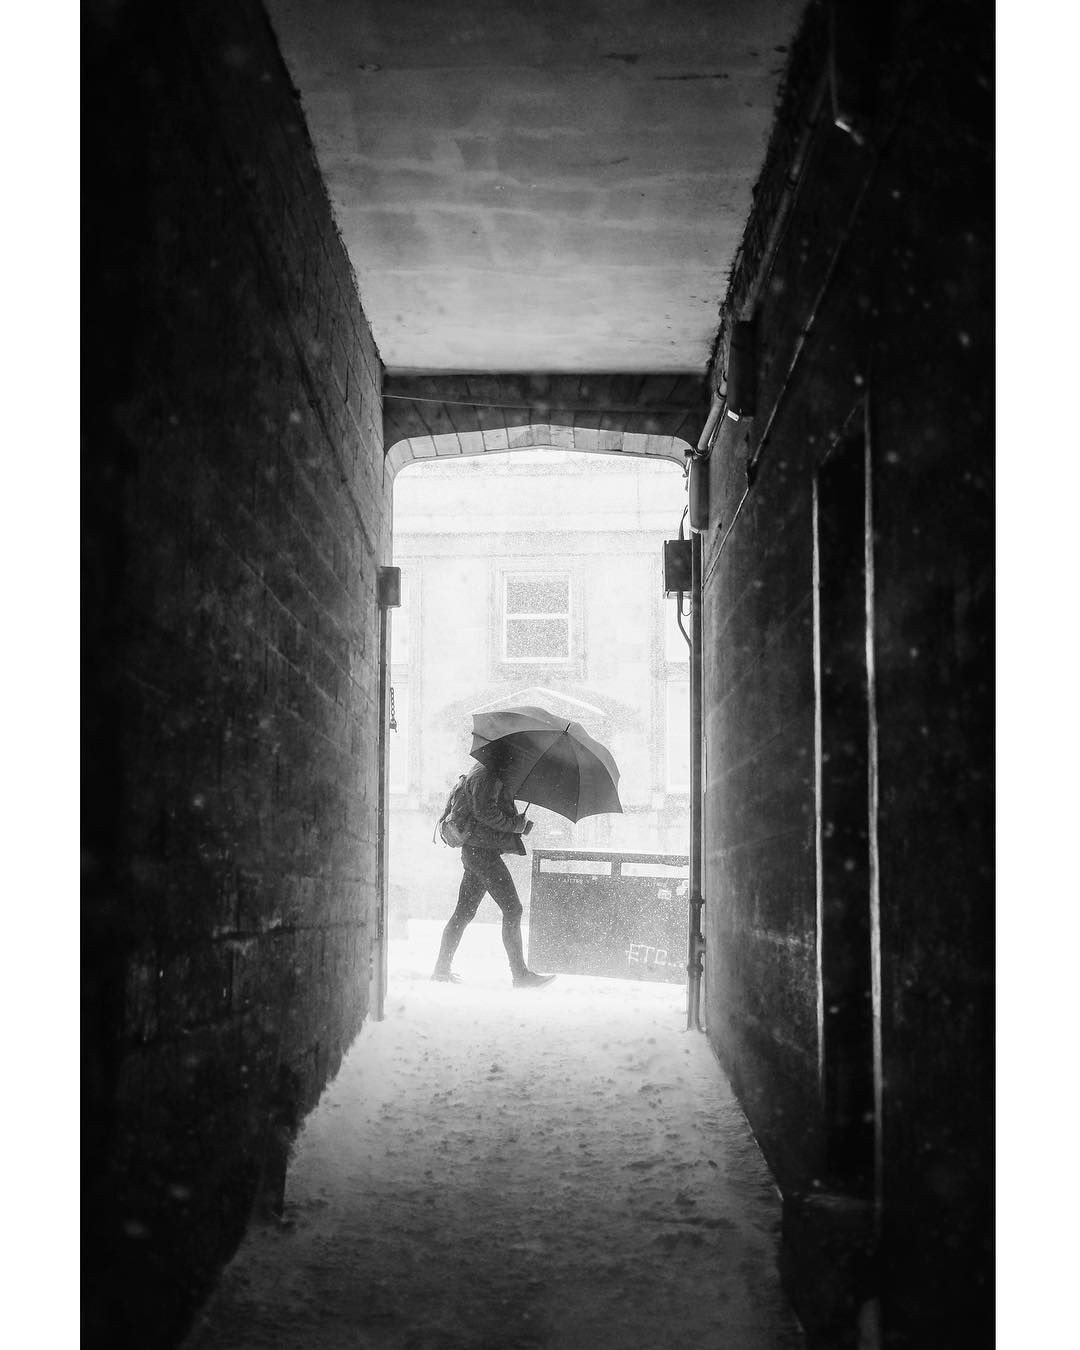 "Pete | Edinburgh | Scotland on Instagram: ""A favourite from last winter #tbt . . . #edinphoto #life_is_street #igersedinburgh #fromstreetswithlove #thisisscotland #fujifilm_uk…"""